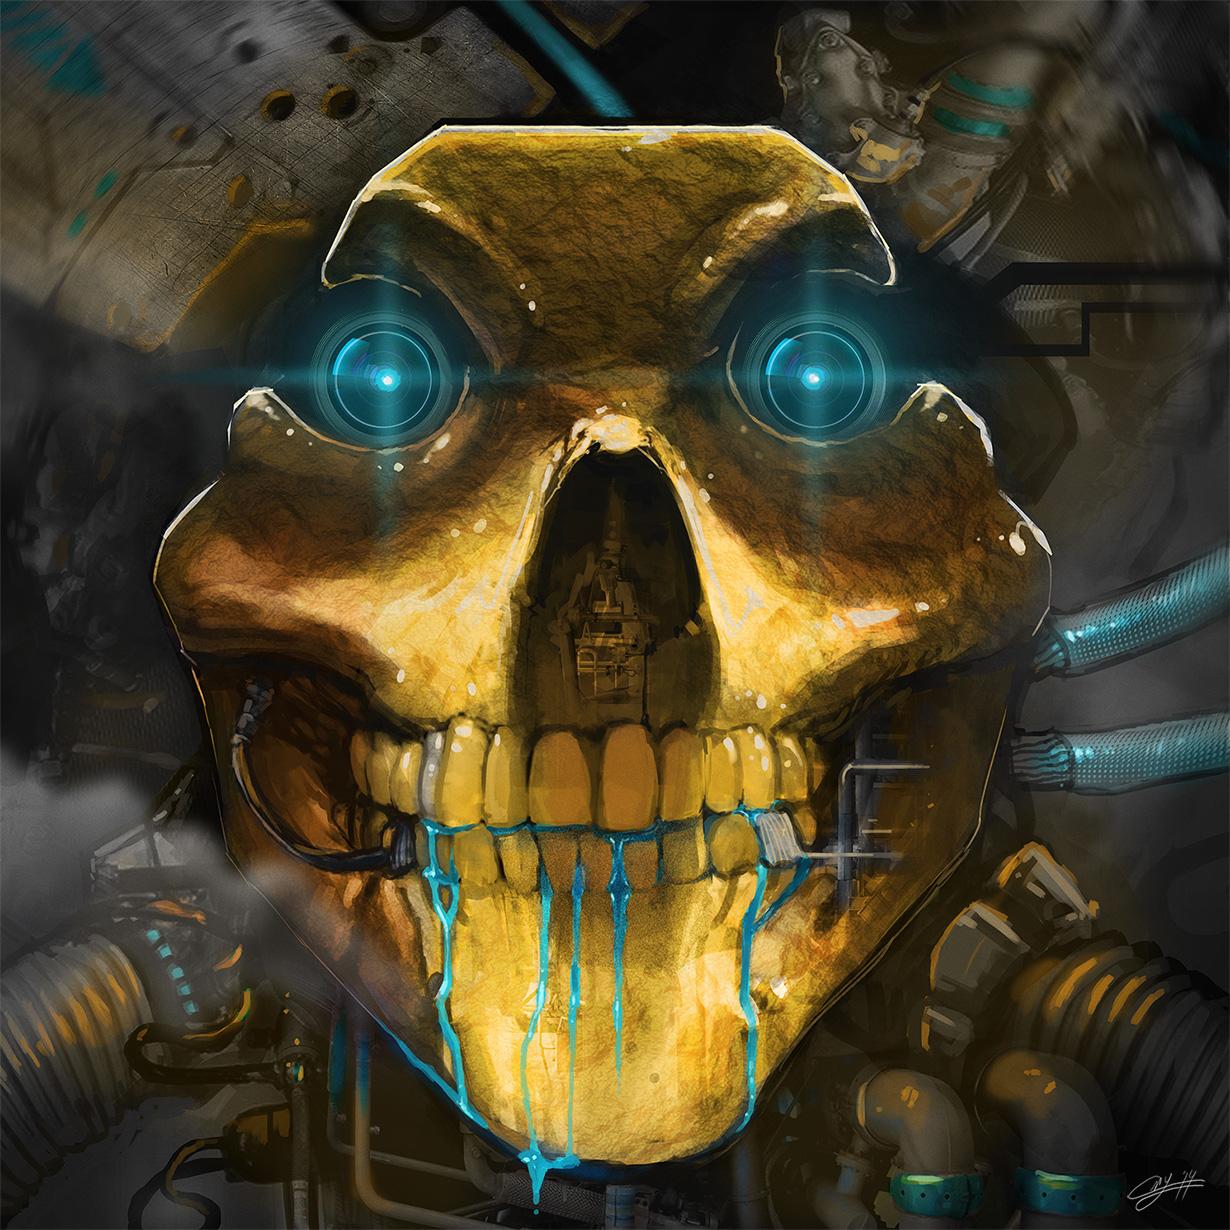 Robot Day 2014!!!